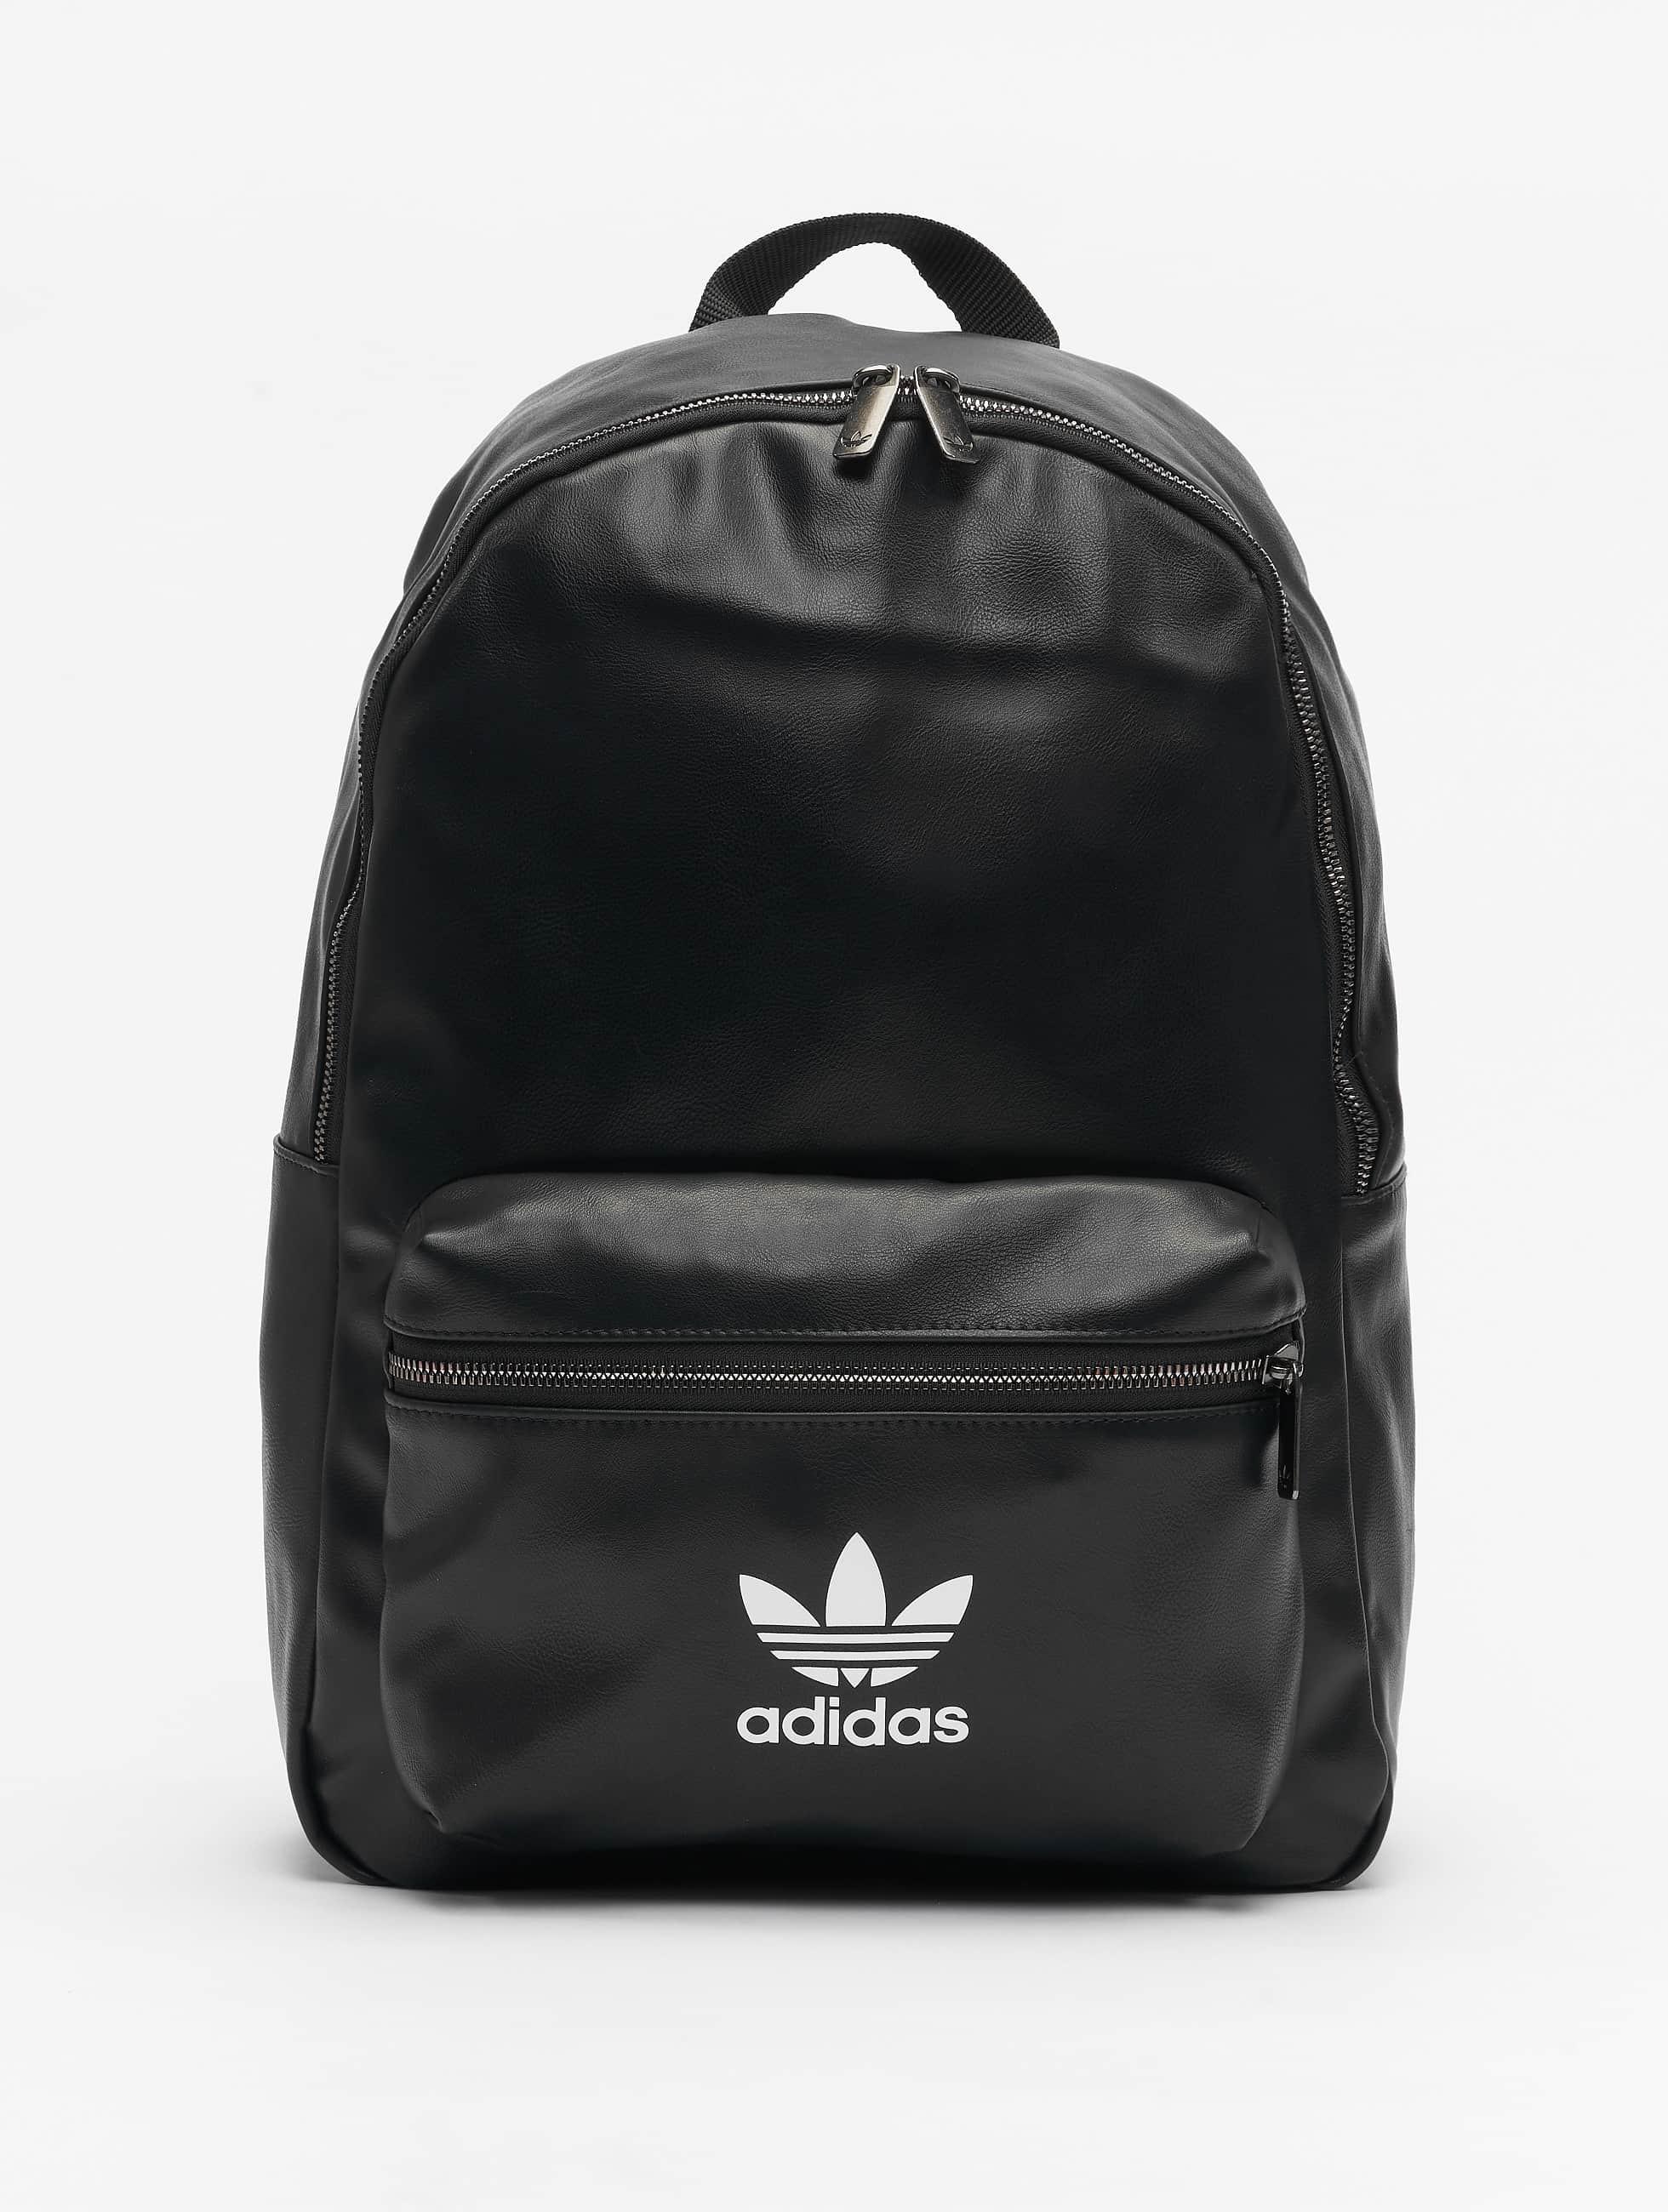 Adidas Originals Cl Backpack Black